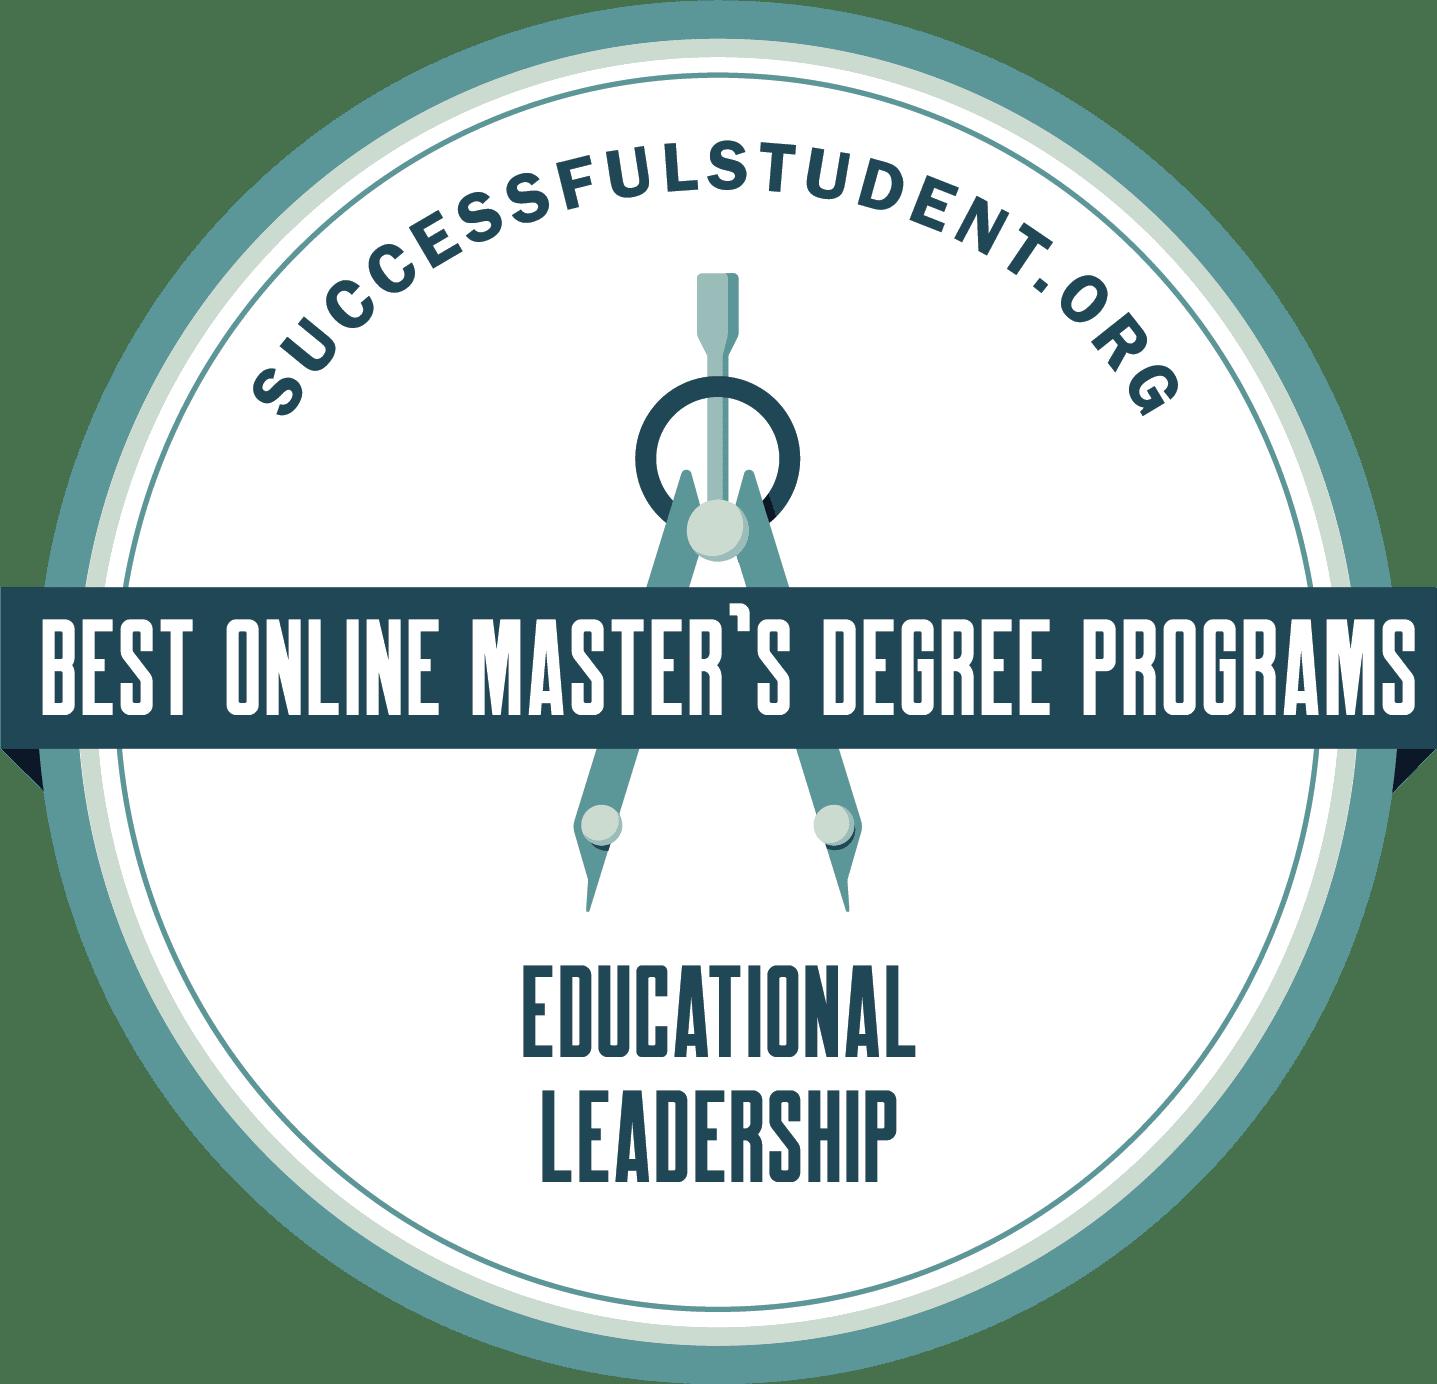 The 25 Best Online Master's in Educational Leadership's Badge